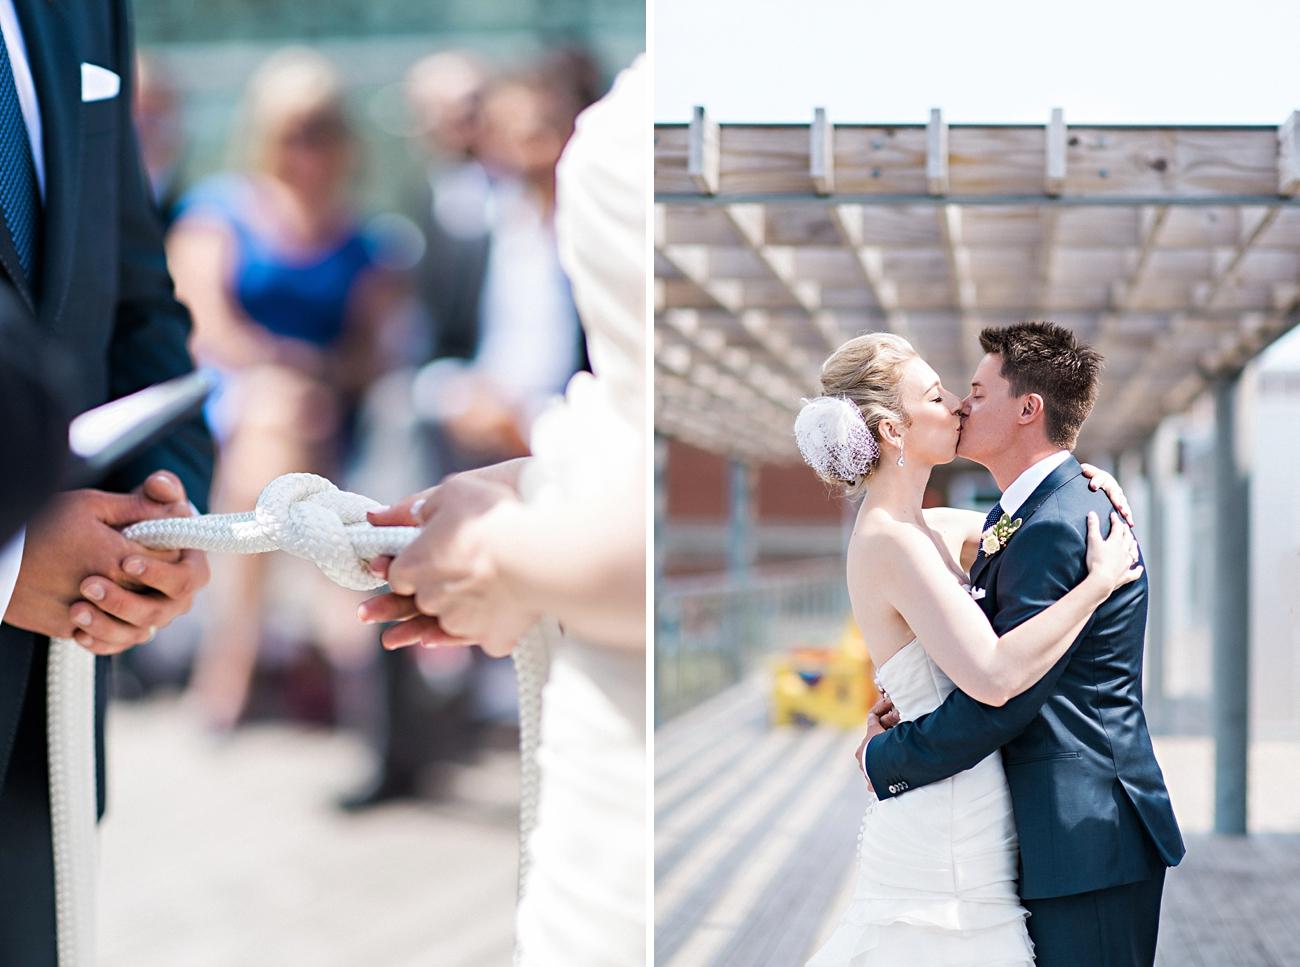 Sara-Seans-Halifax-Prince-George-Hotel-Wedding032.jpg